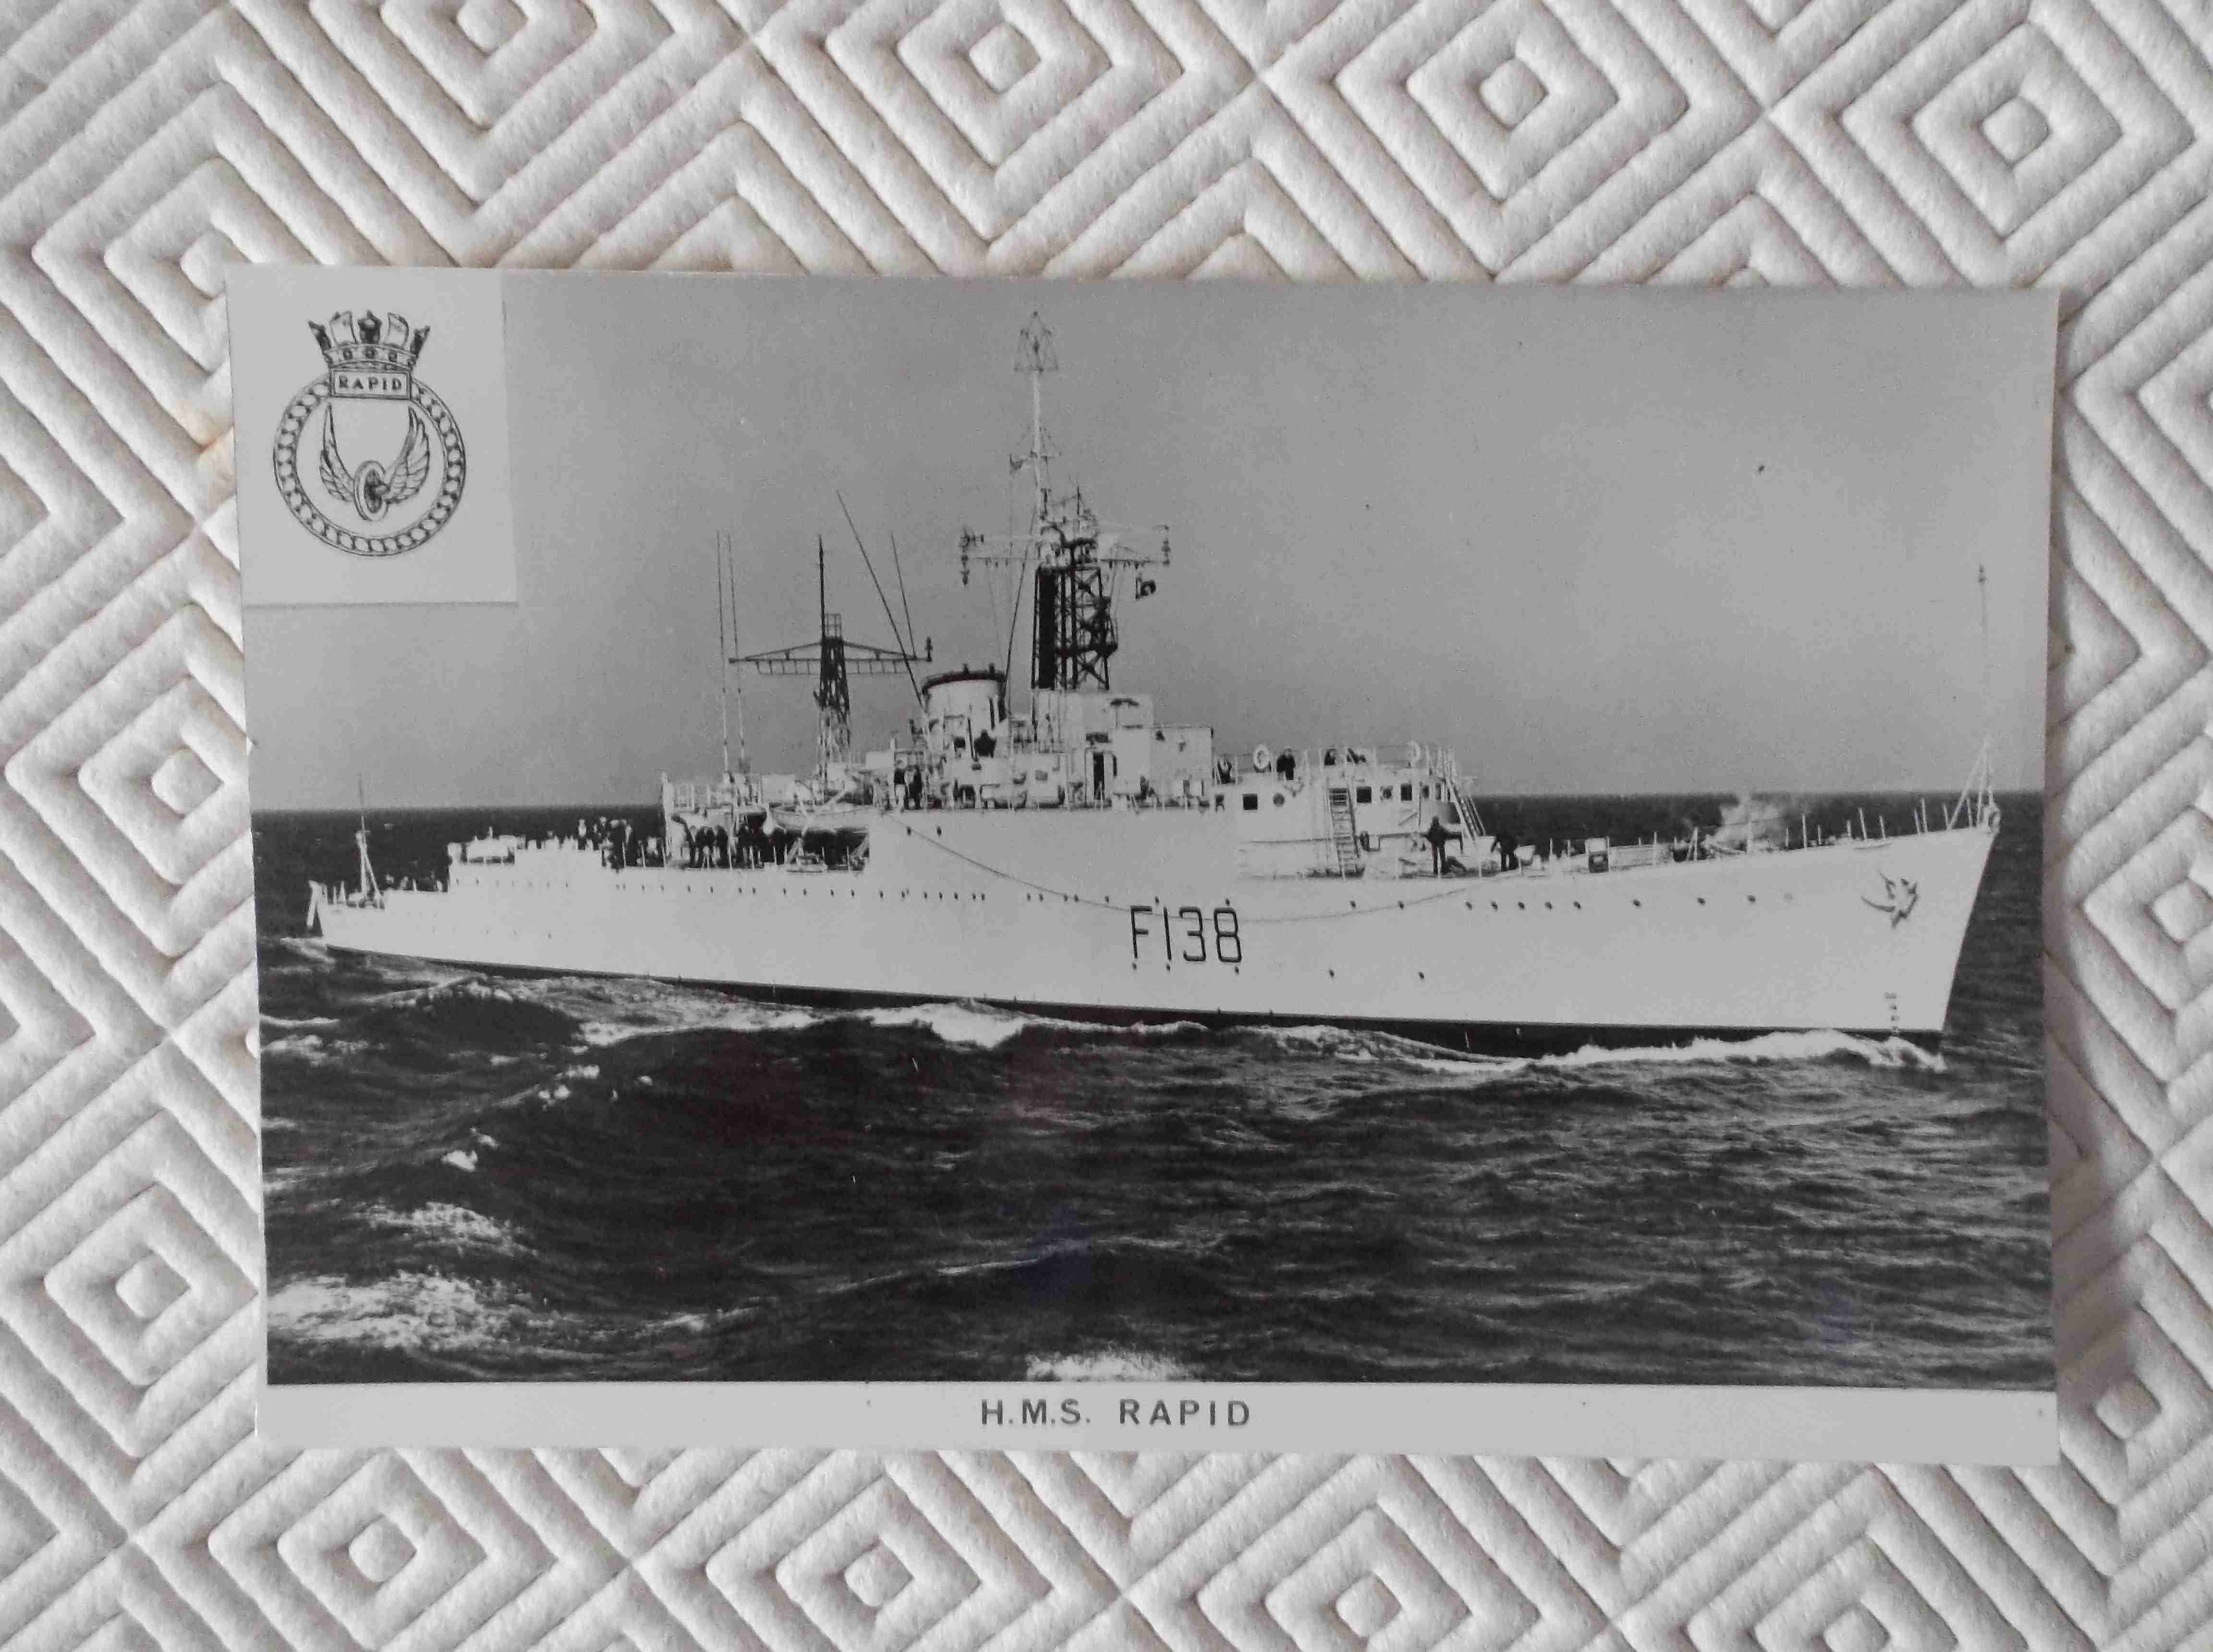 POSTCARD SIZE PHOTOGRAPH OF THE ROYAL NAVAL VESSEL HMS RAPID